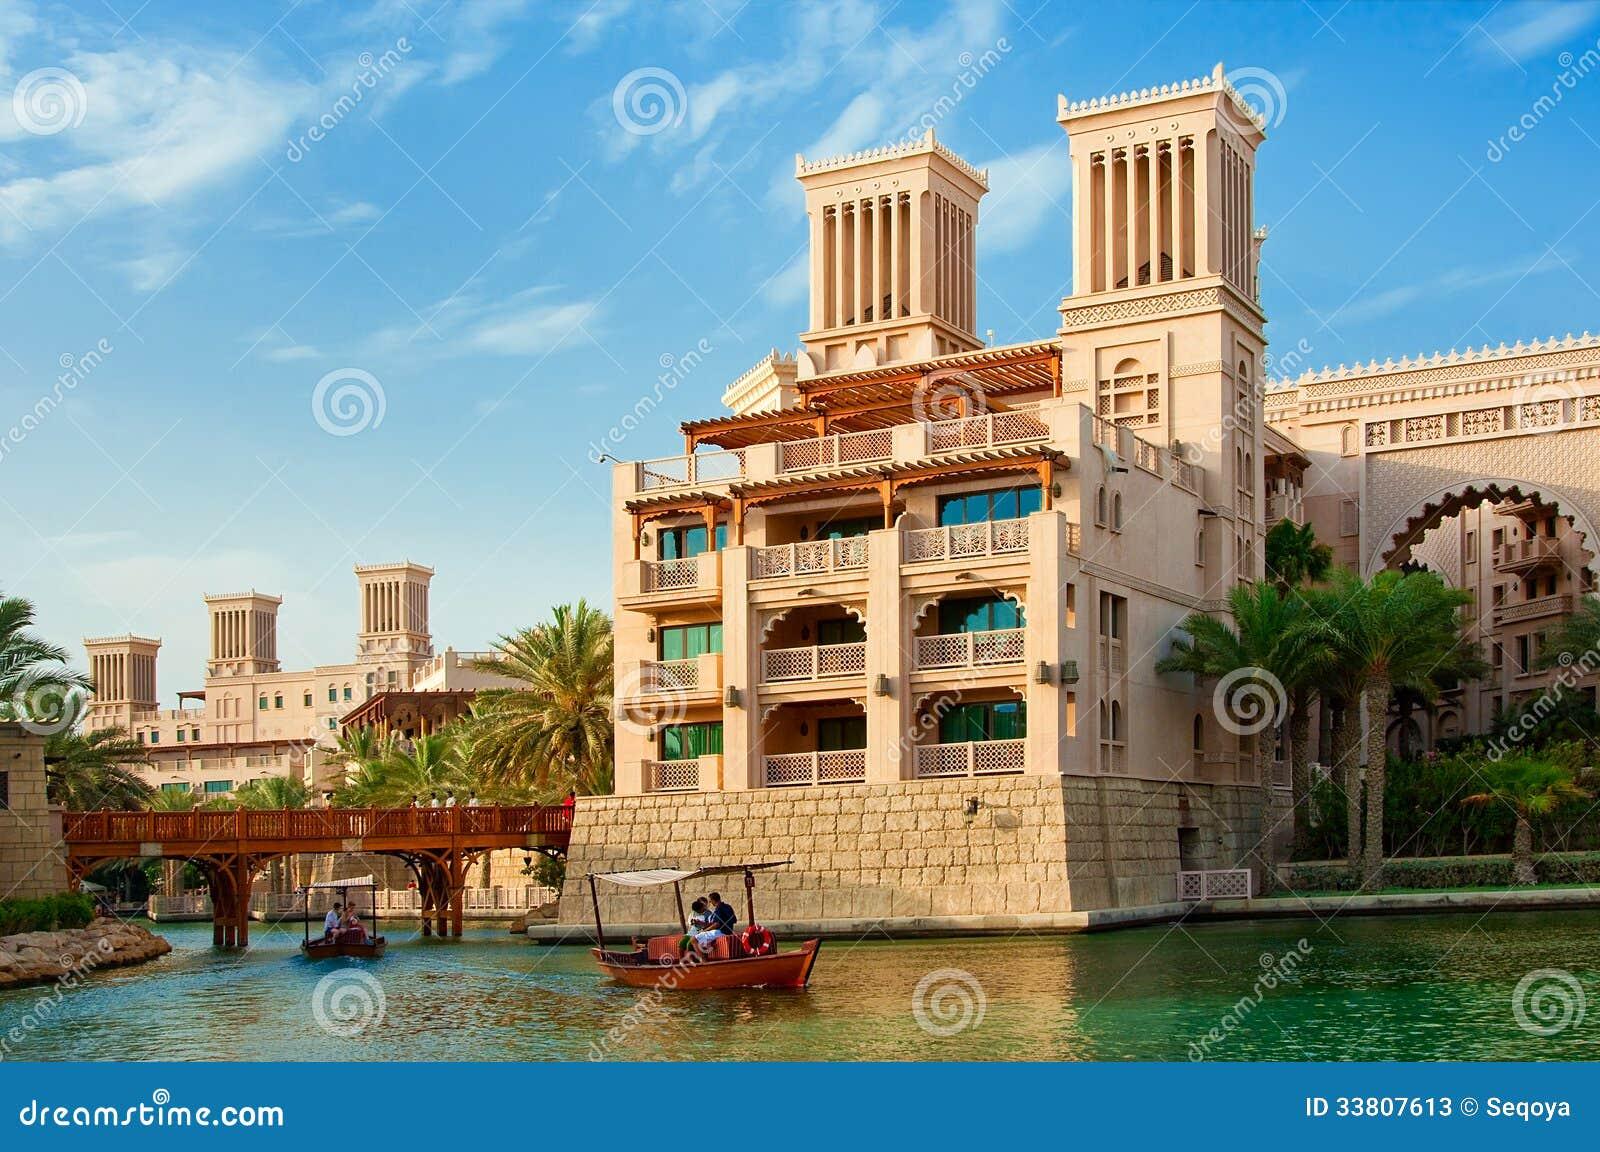 Dubai june 3 the famous hotel and tourist district of for Hotel dubai design district